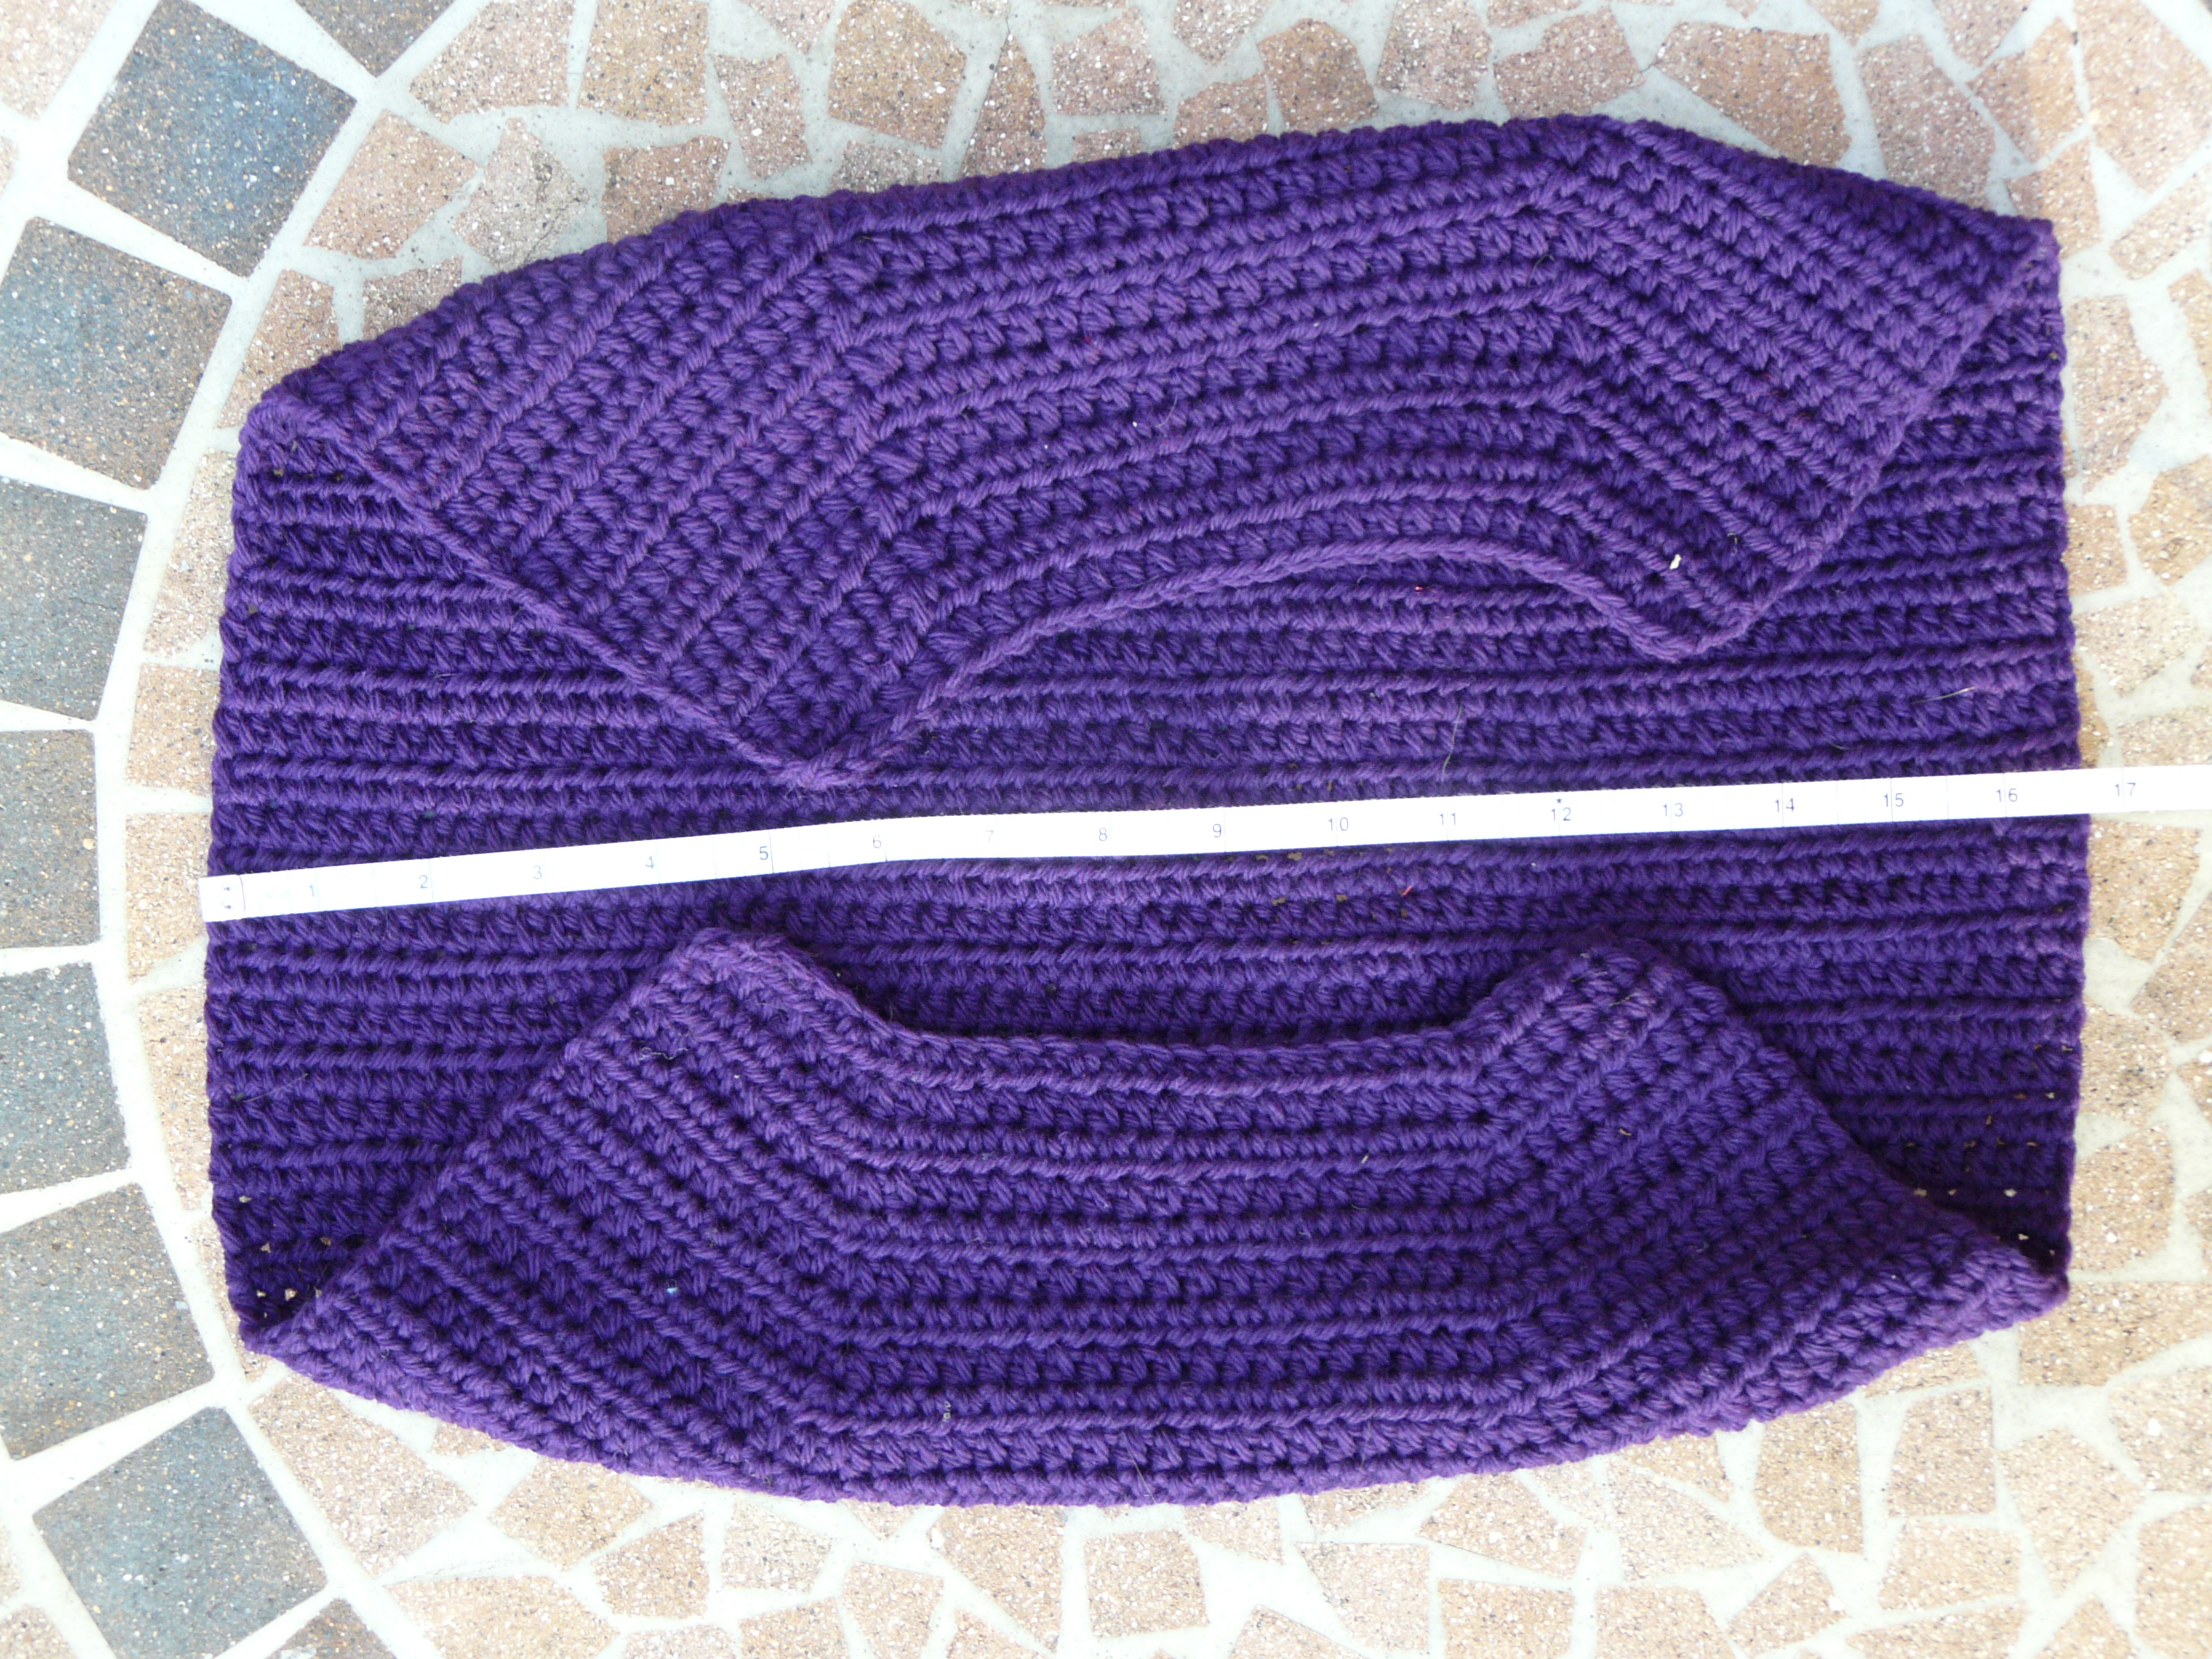 Free Crochet Patterns Fat Bottom Bag : fat bottom bag Archives - Page 2 of 2 - Crochetbug